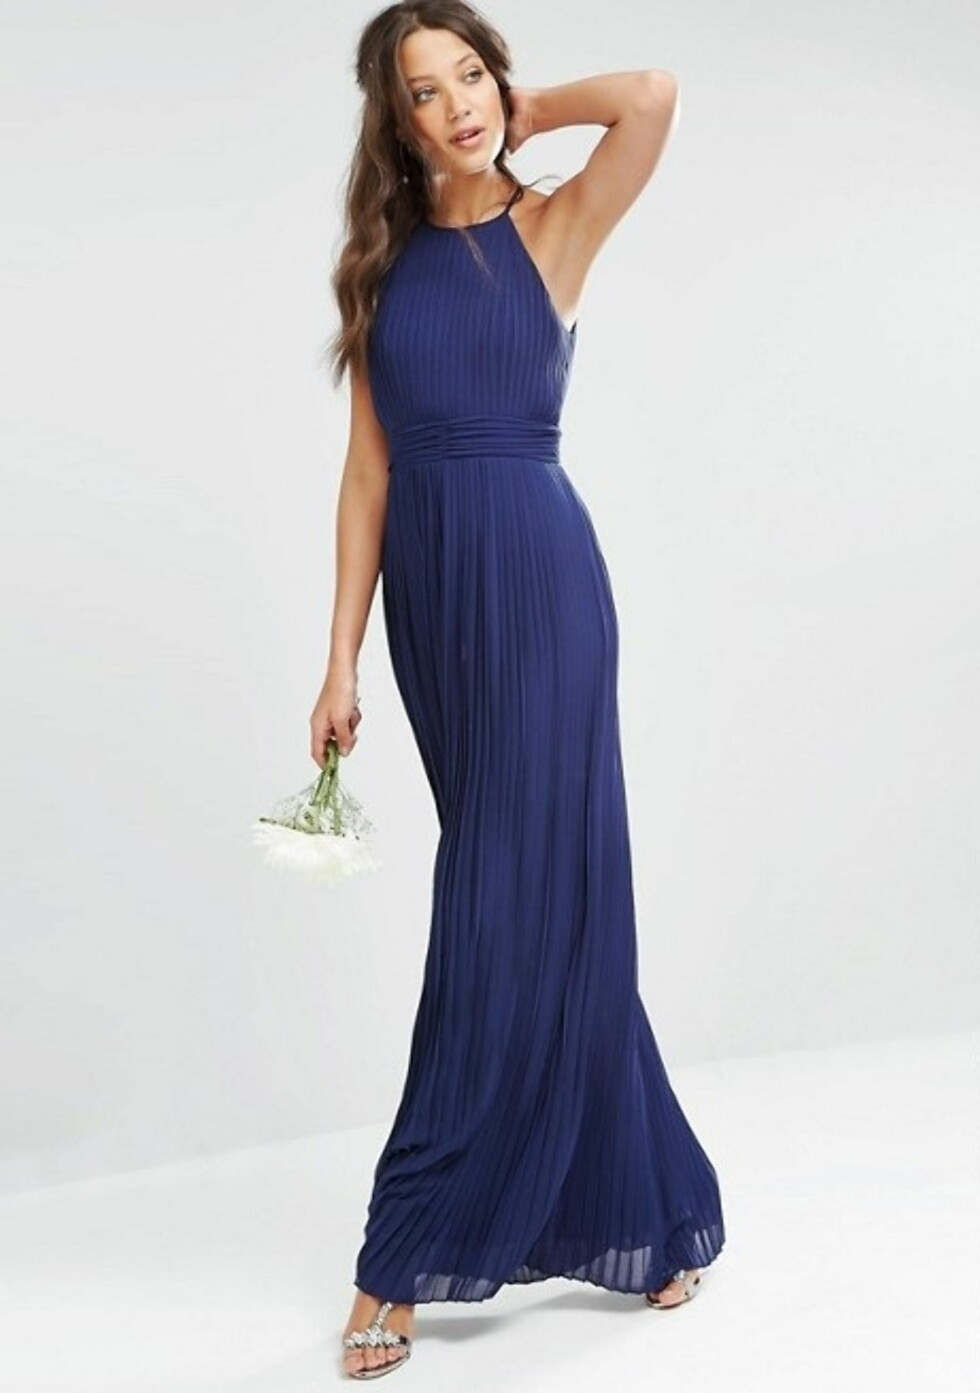 Kjole fra TFNC via Asos.com |558,-| http://www.asos.com/tfnc-tall/tfnc-tall-wedding-high-neck-pleated-maxi-dress/prd/8553334?clr=navy&SearchQuery=prom%20dress&gridcolumn=1&gridrow=15&gridsize=4&pge=4&pgesize=72&totalstyles=1606